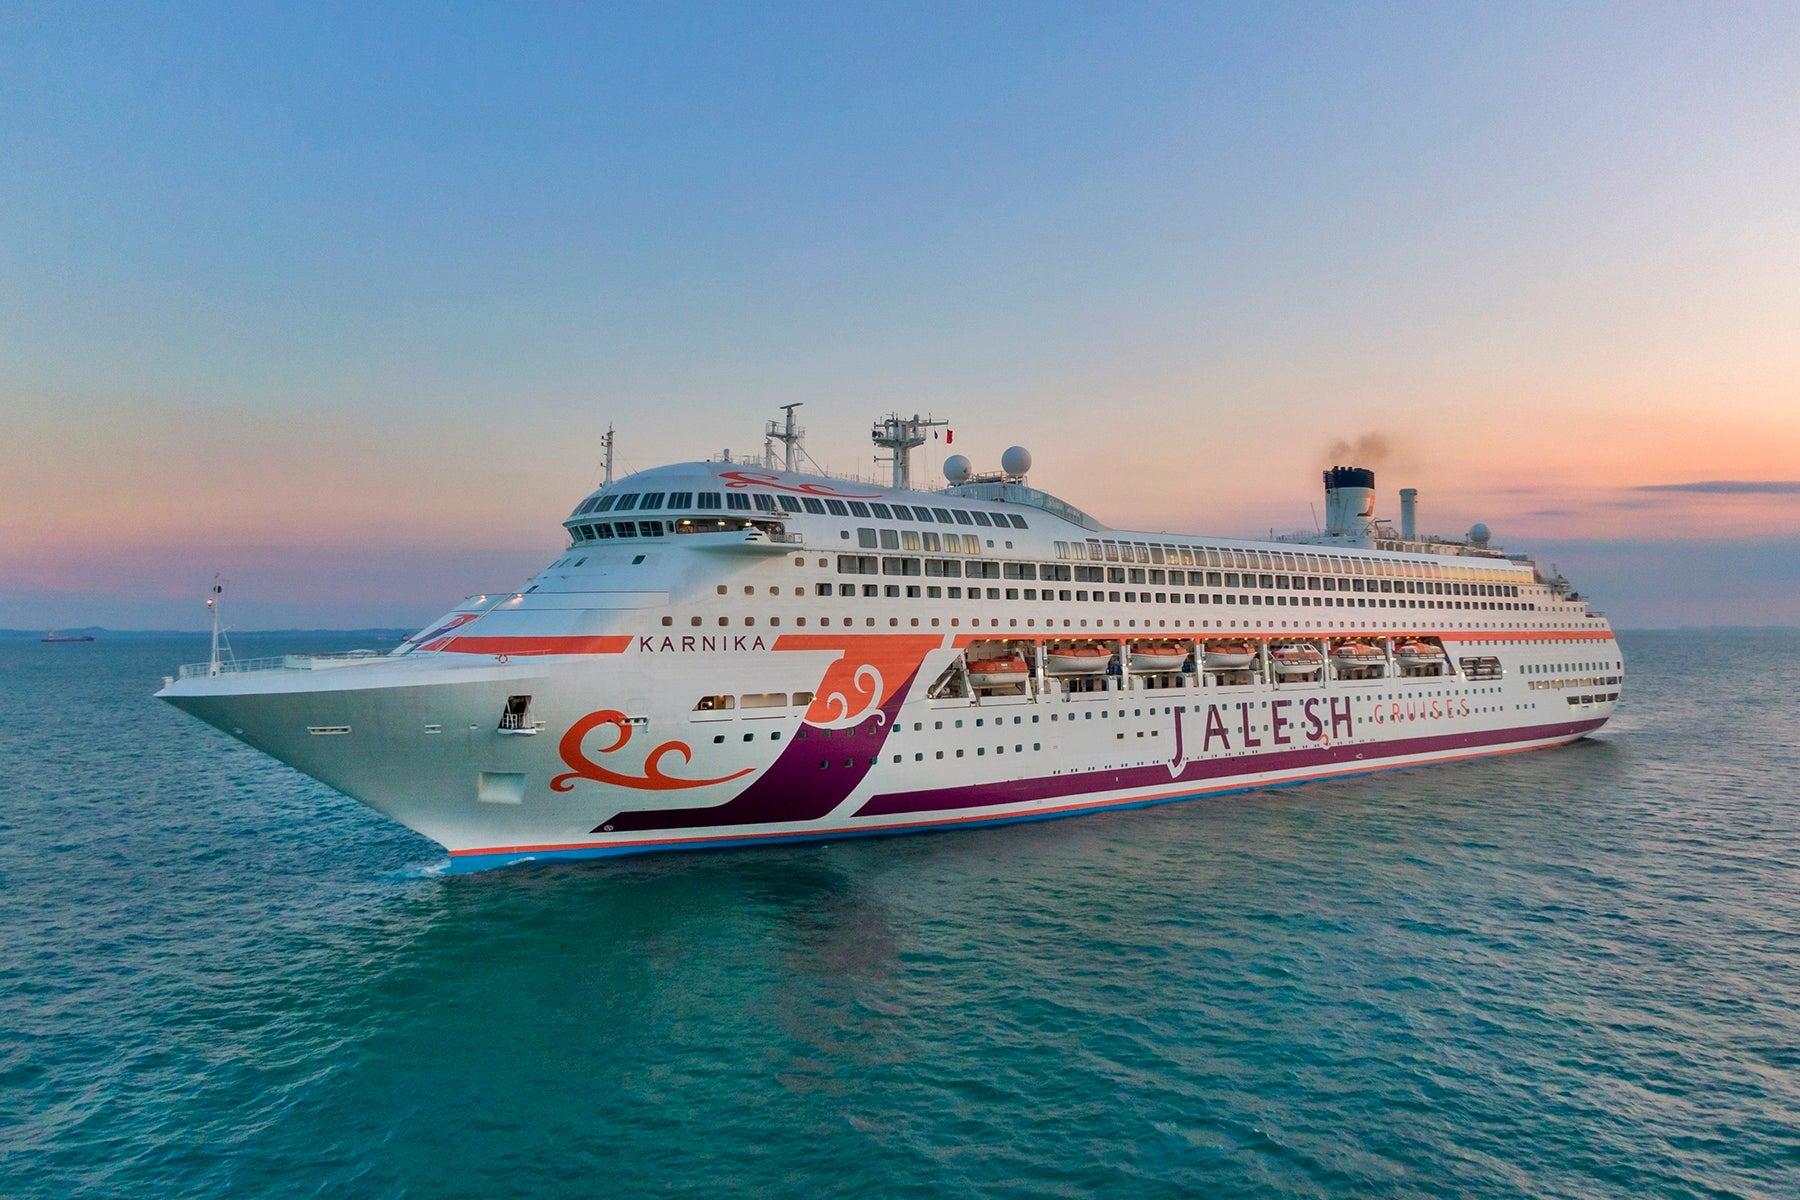 The coronavirus crisis claims a sixth cruise line